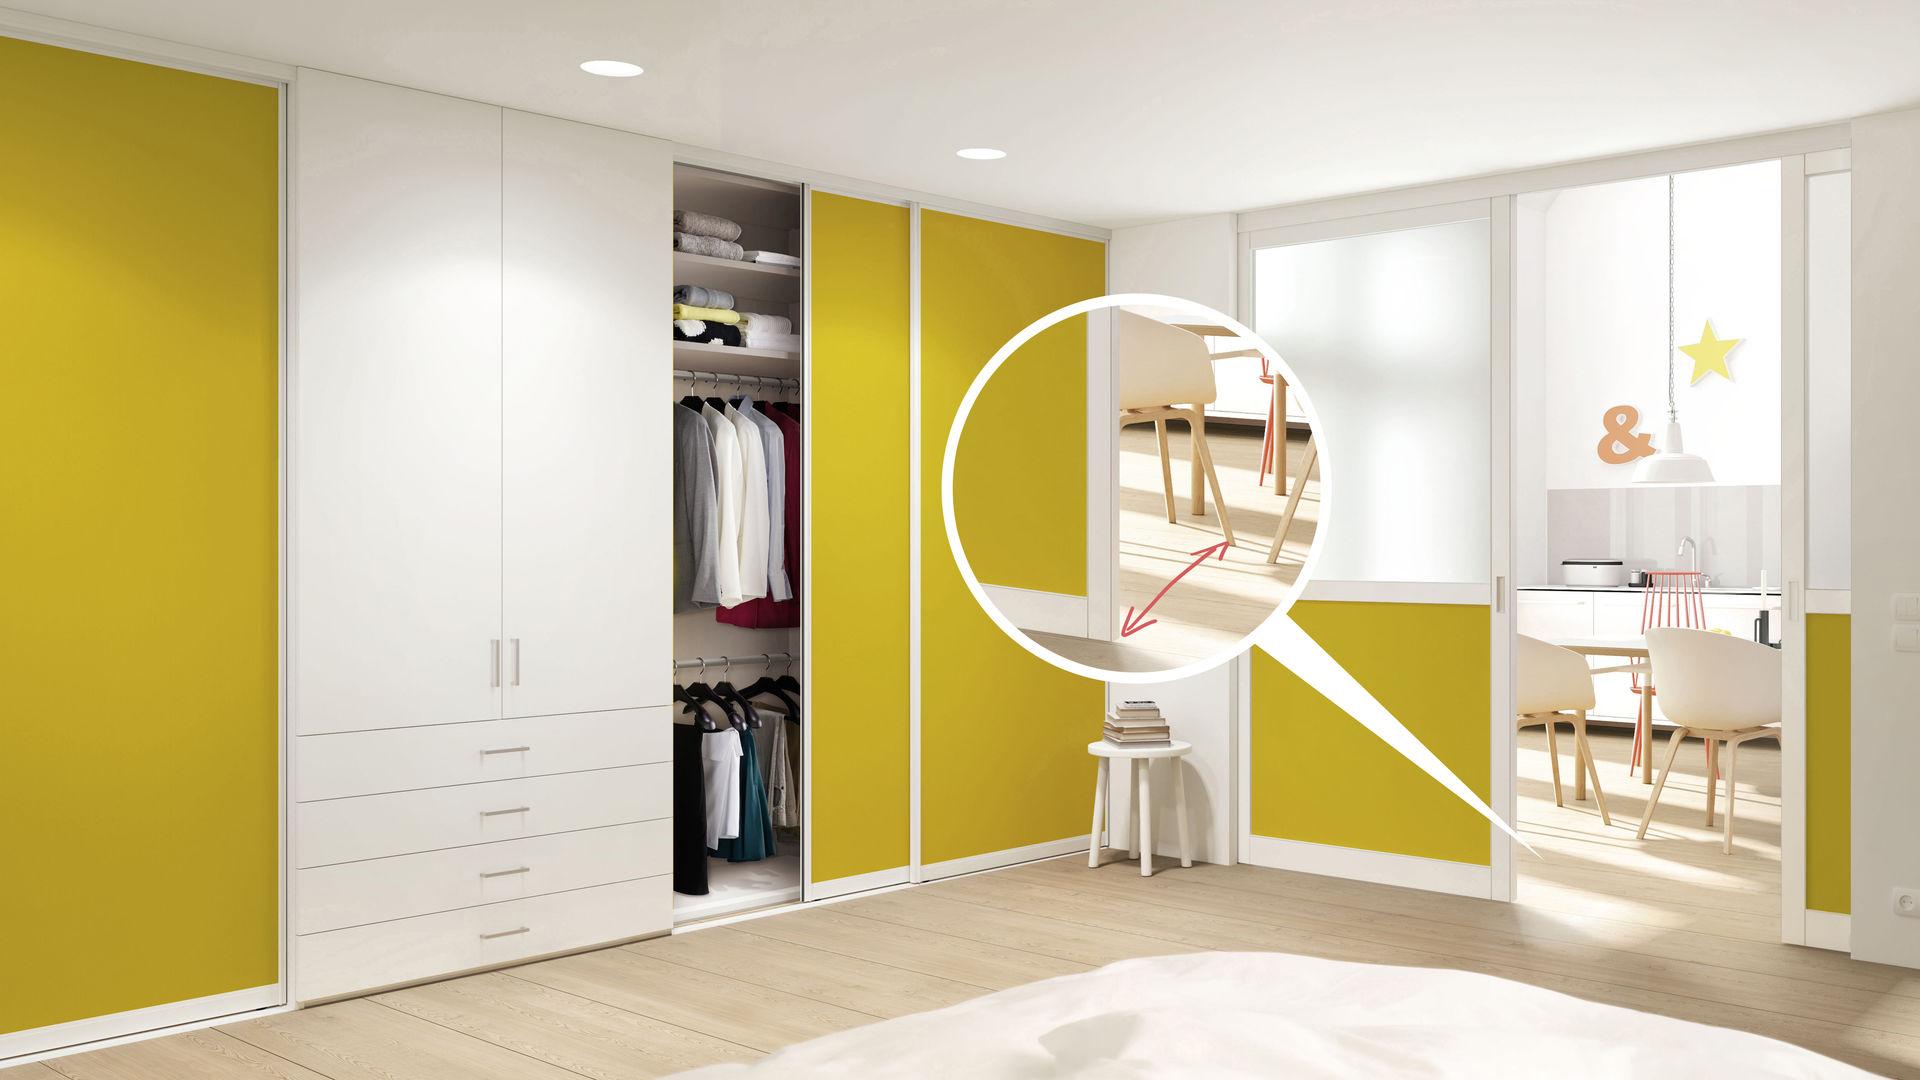 Milanodoors sliding doors The Space-Saving Wonder 1